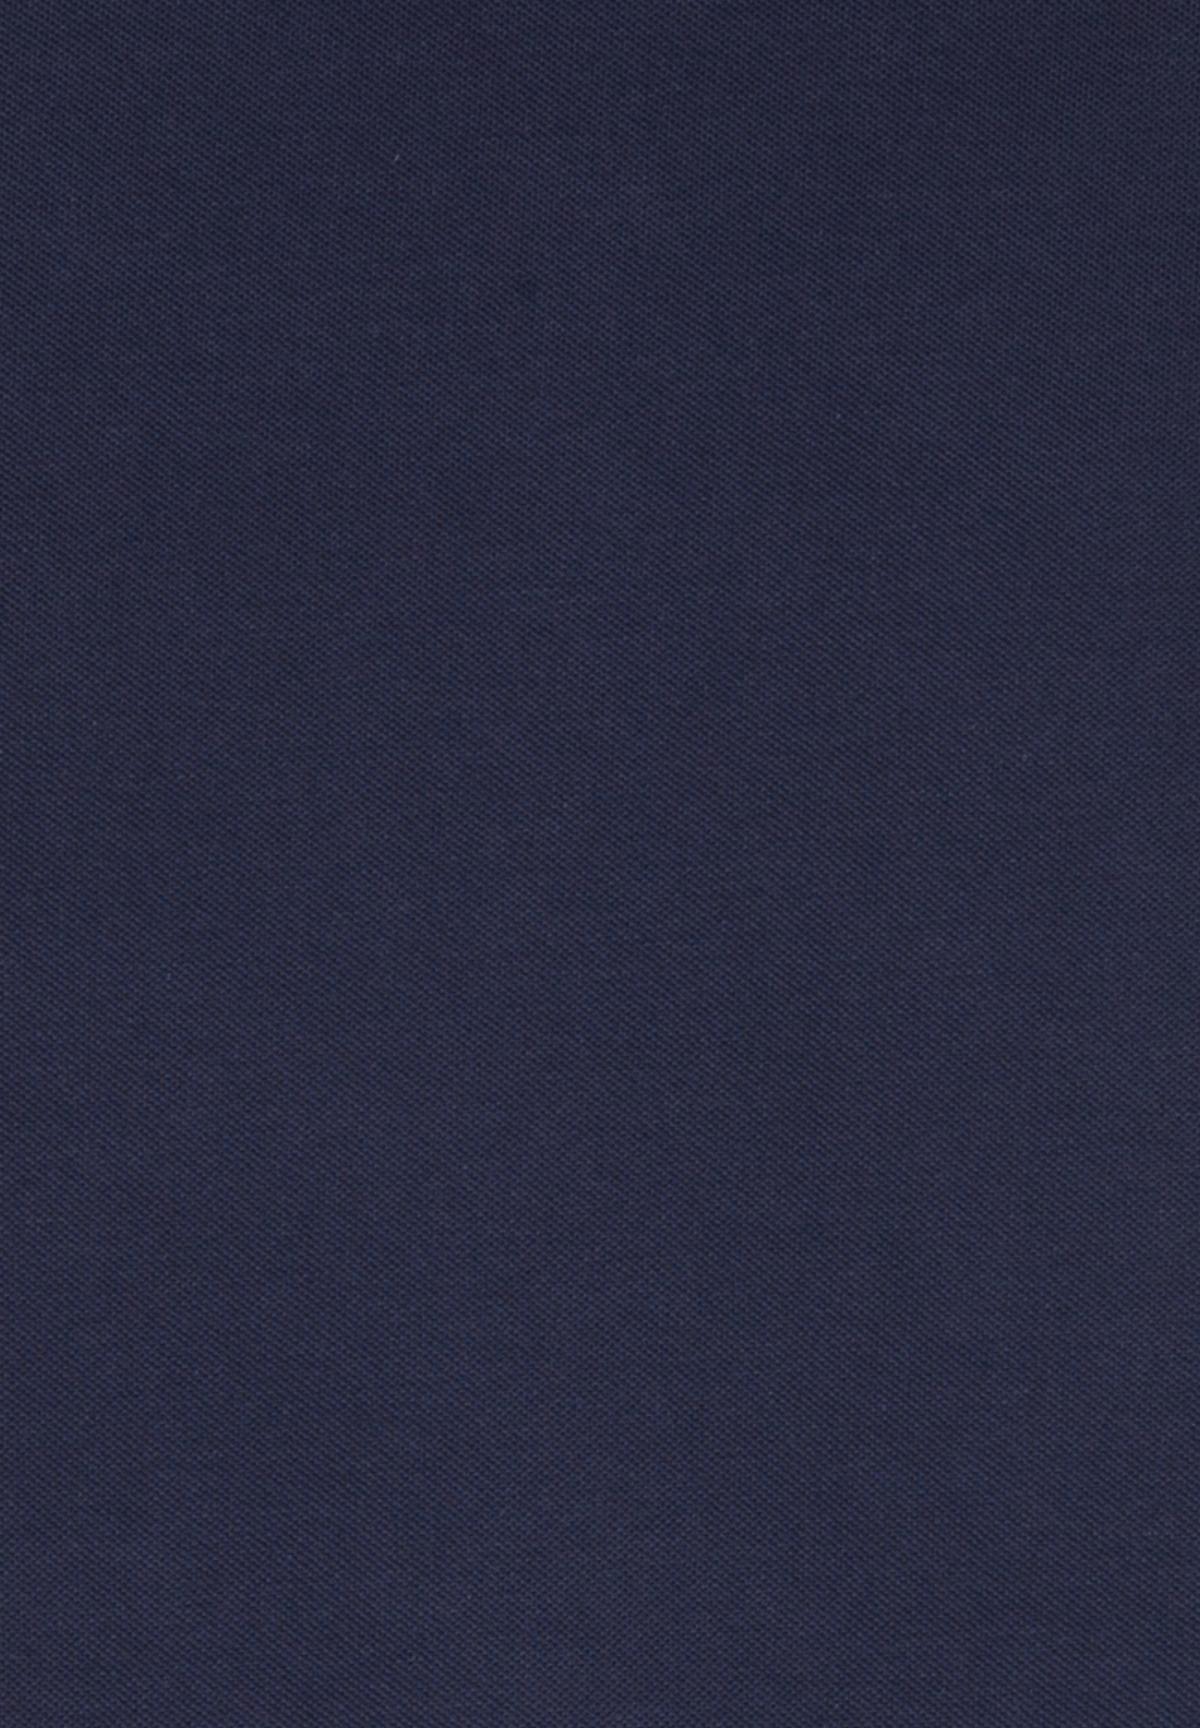 Camel-Active-Herren-Shirt-Poloshirt-Pique-Regular-Fit-NEU Indexbild 26